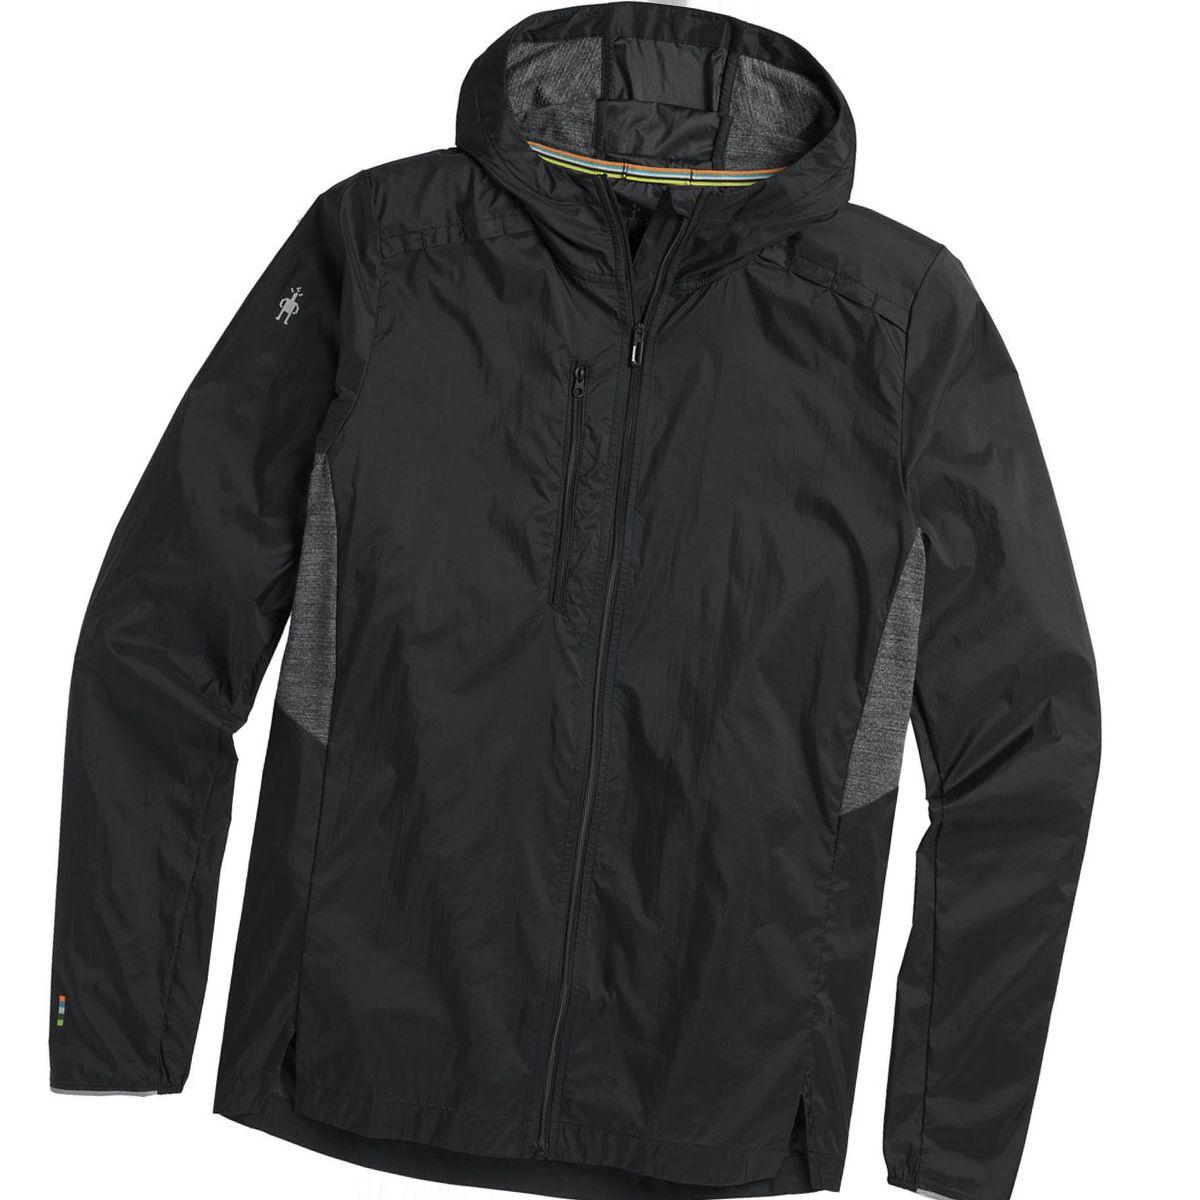 Smartwool Merino Sport Ultra Light Hooded Jacket - Men's